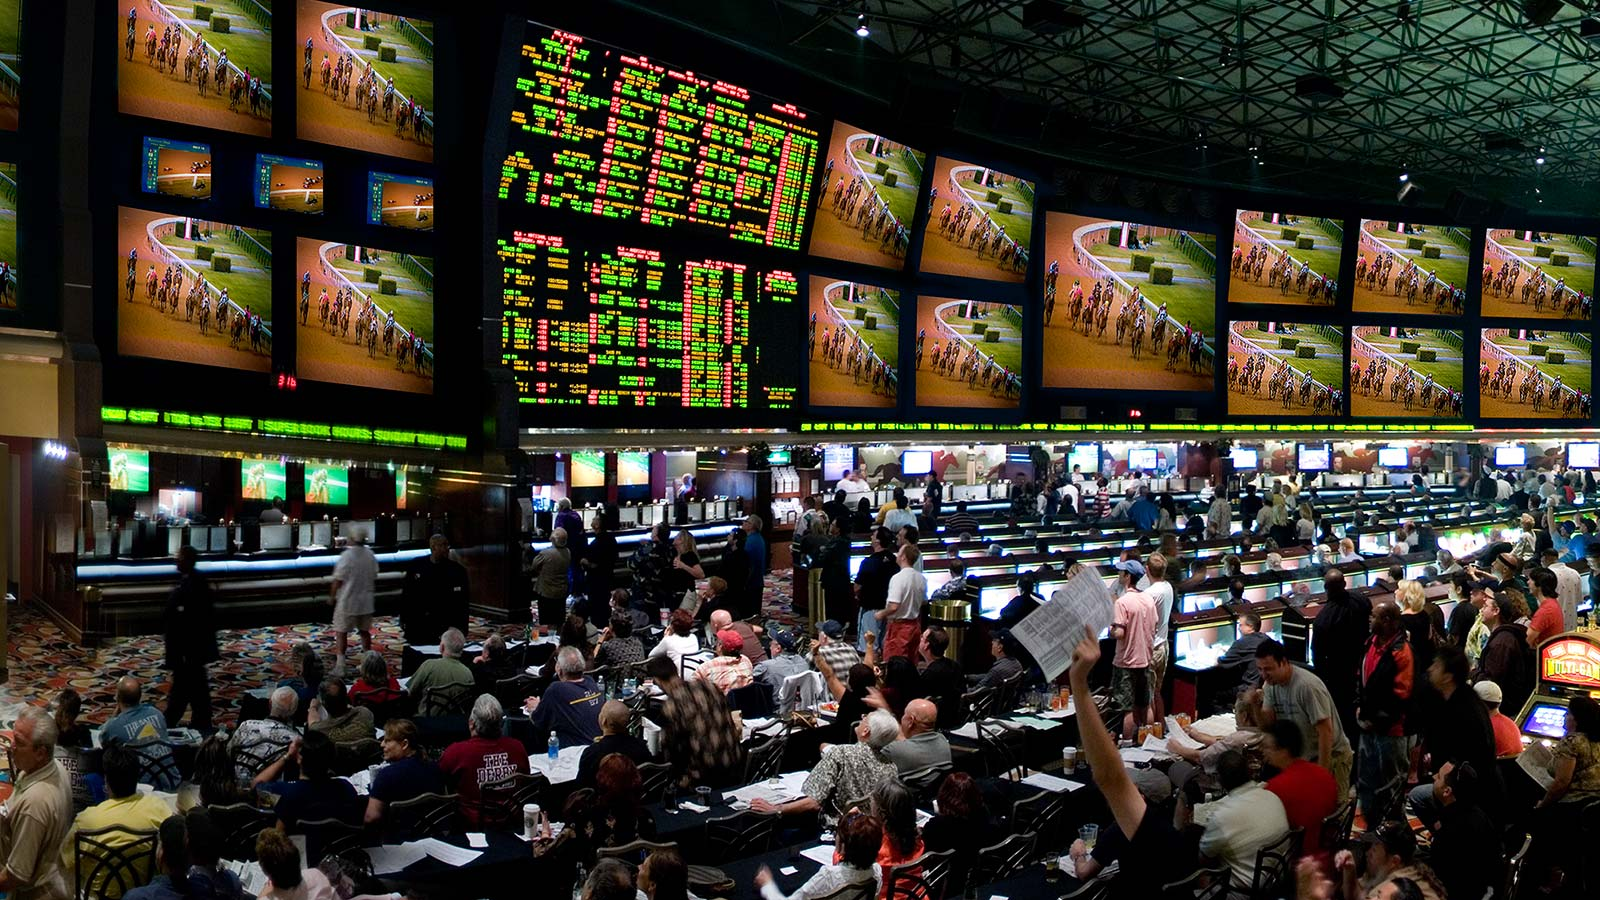 Lvh sports betting prop odds nz betting tables